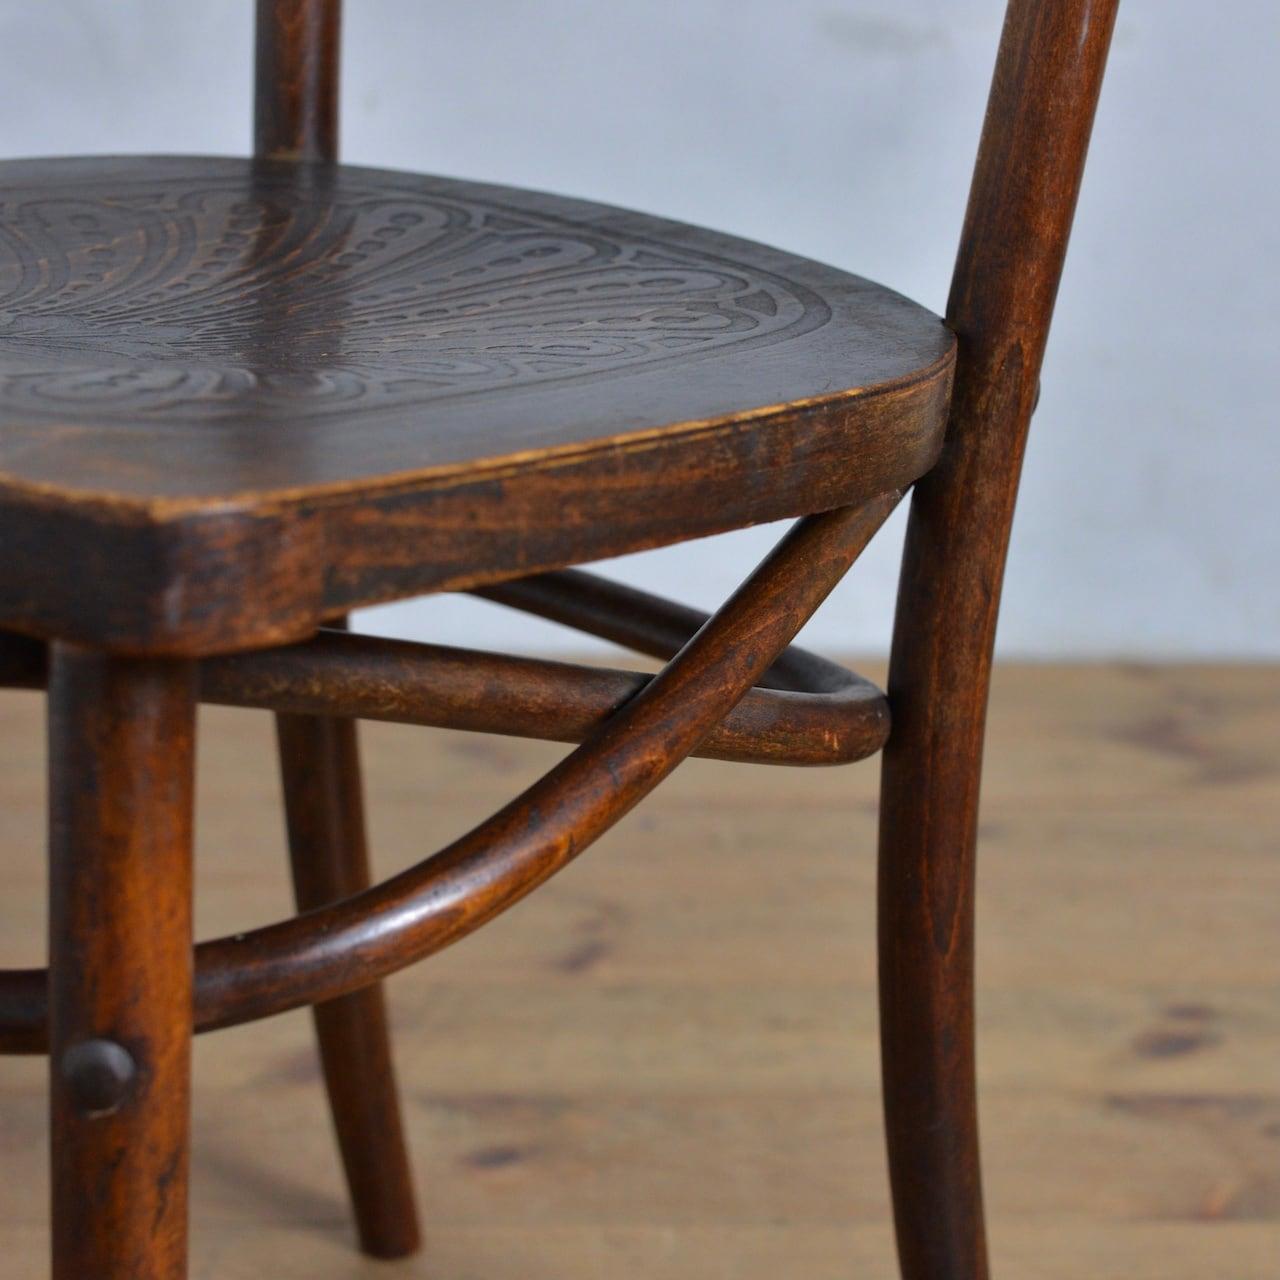 Bentwood Chair / ベントウッドチェア 【C】〈チェア・椅子・ダイニングチェア・デスクチェア・曲木〉SB2012-0002 【C】